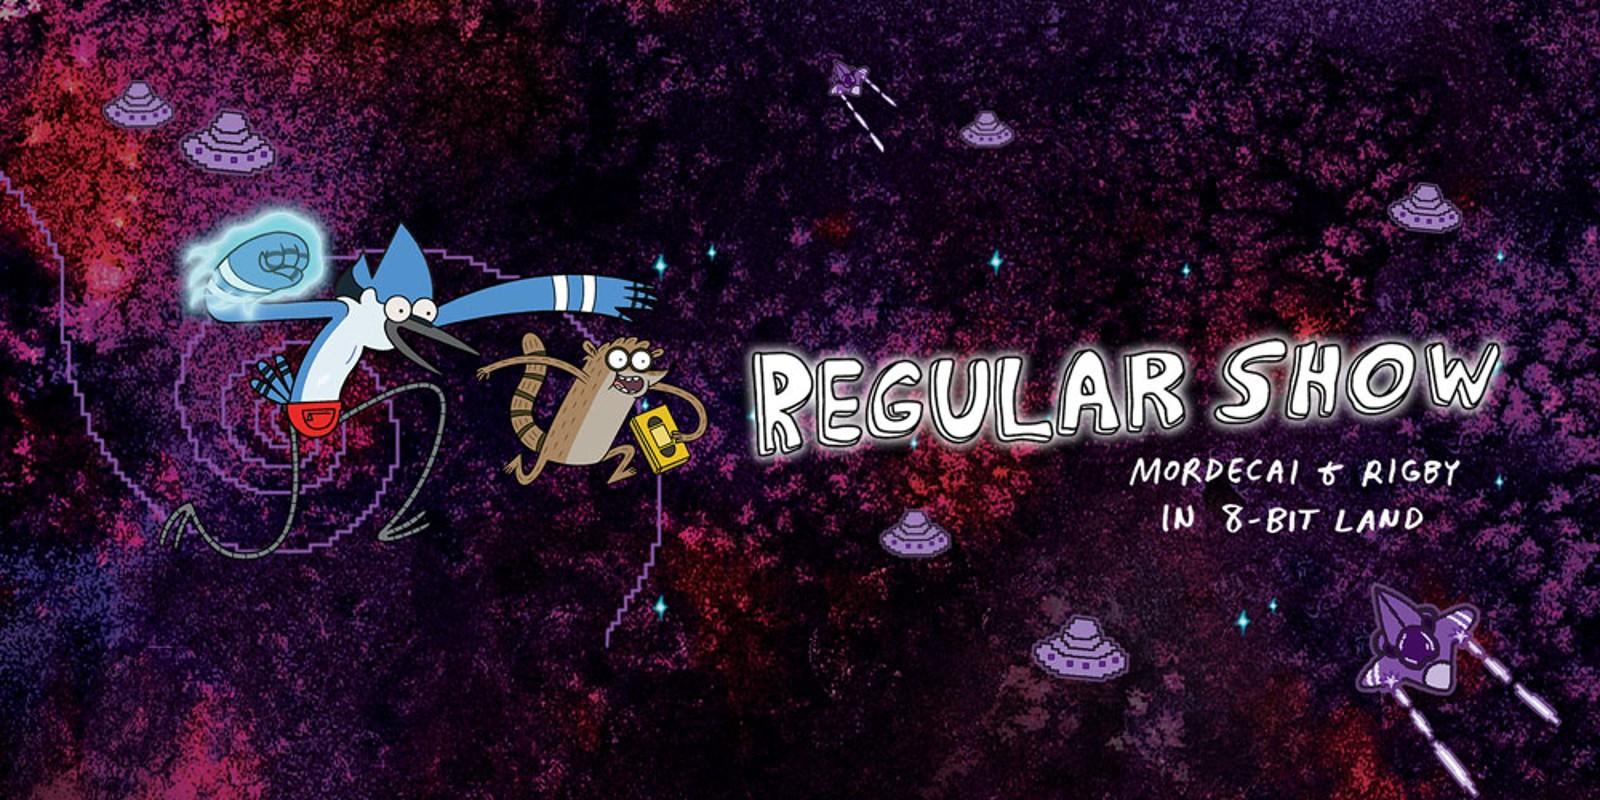 Regular Show: Mordecai & Rigby in 8.